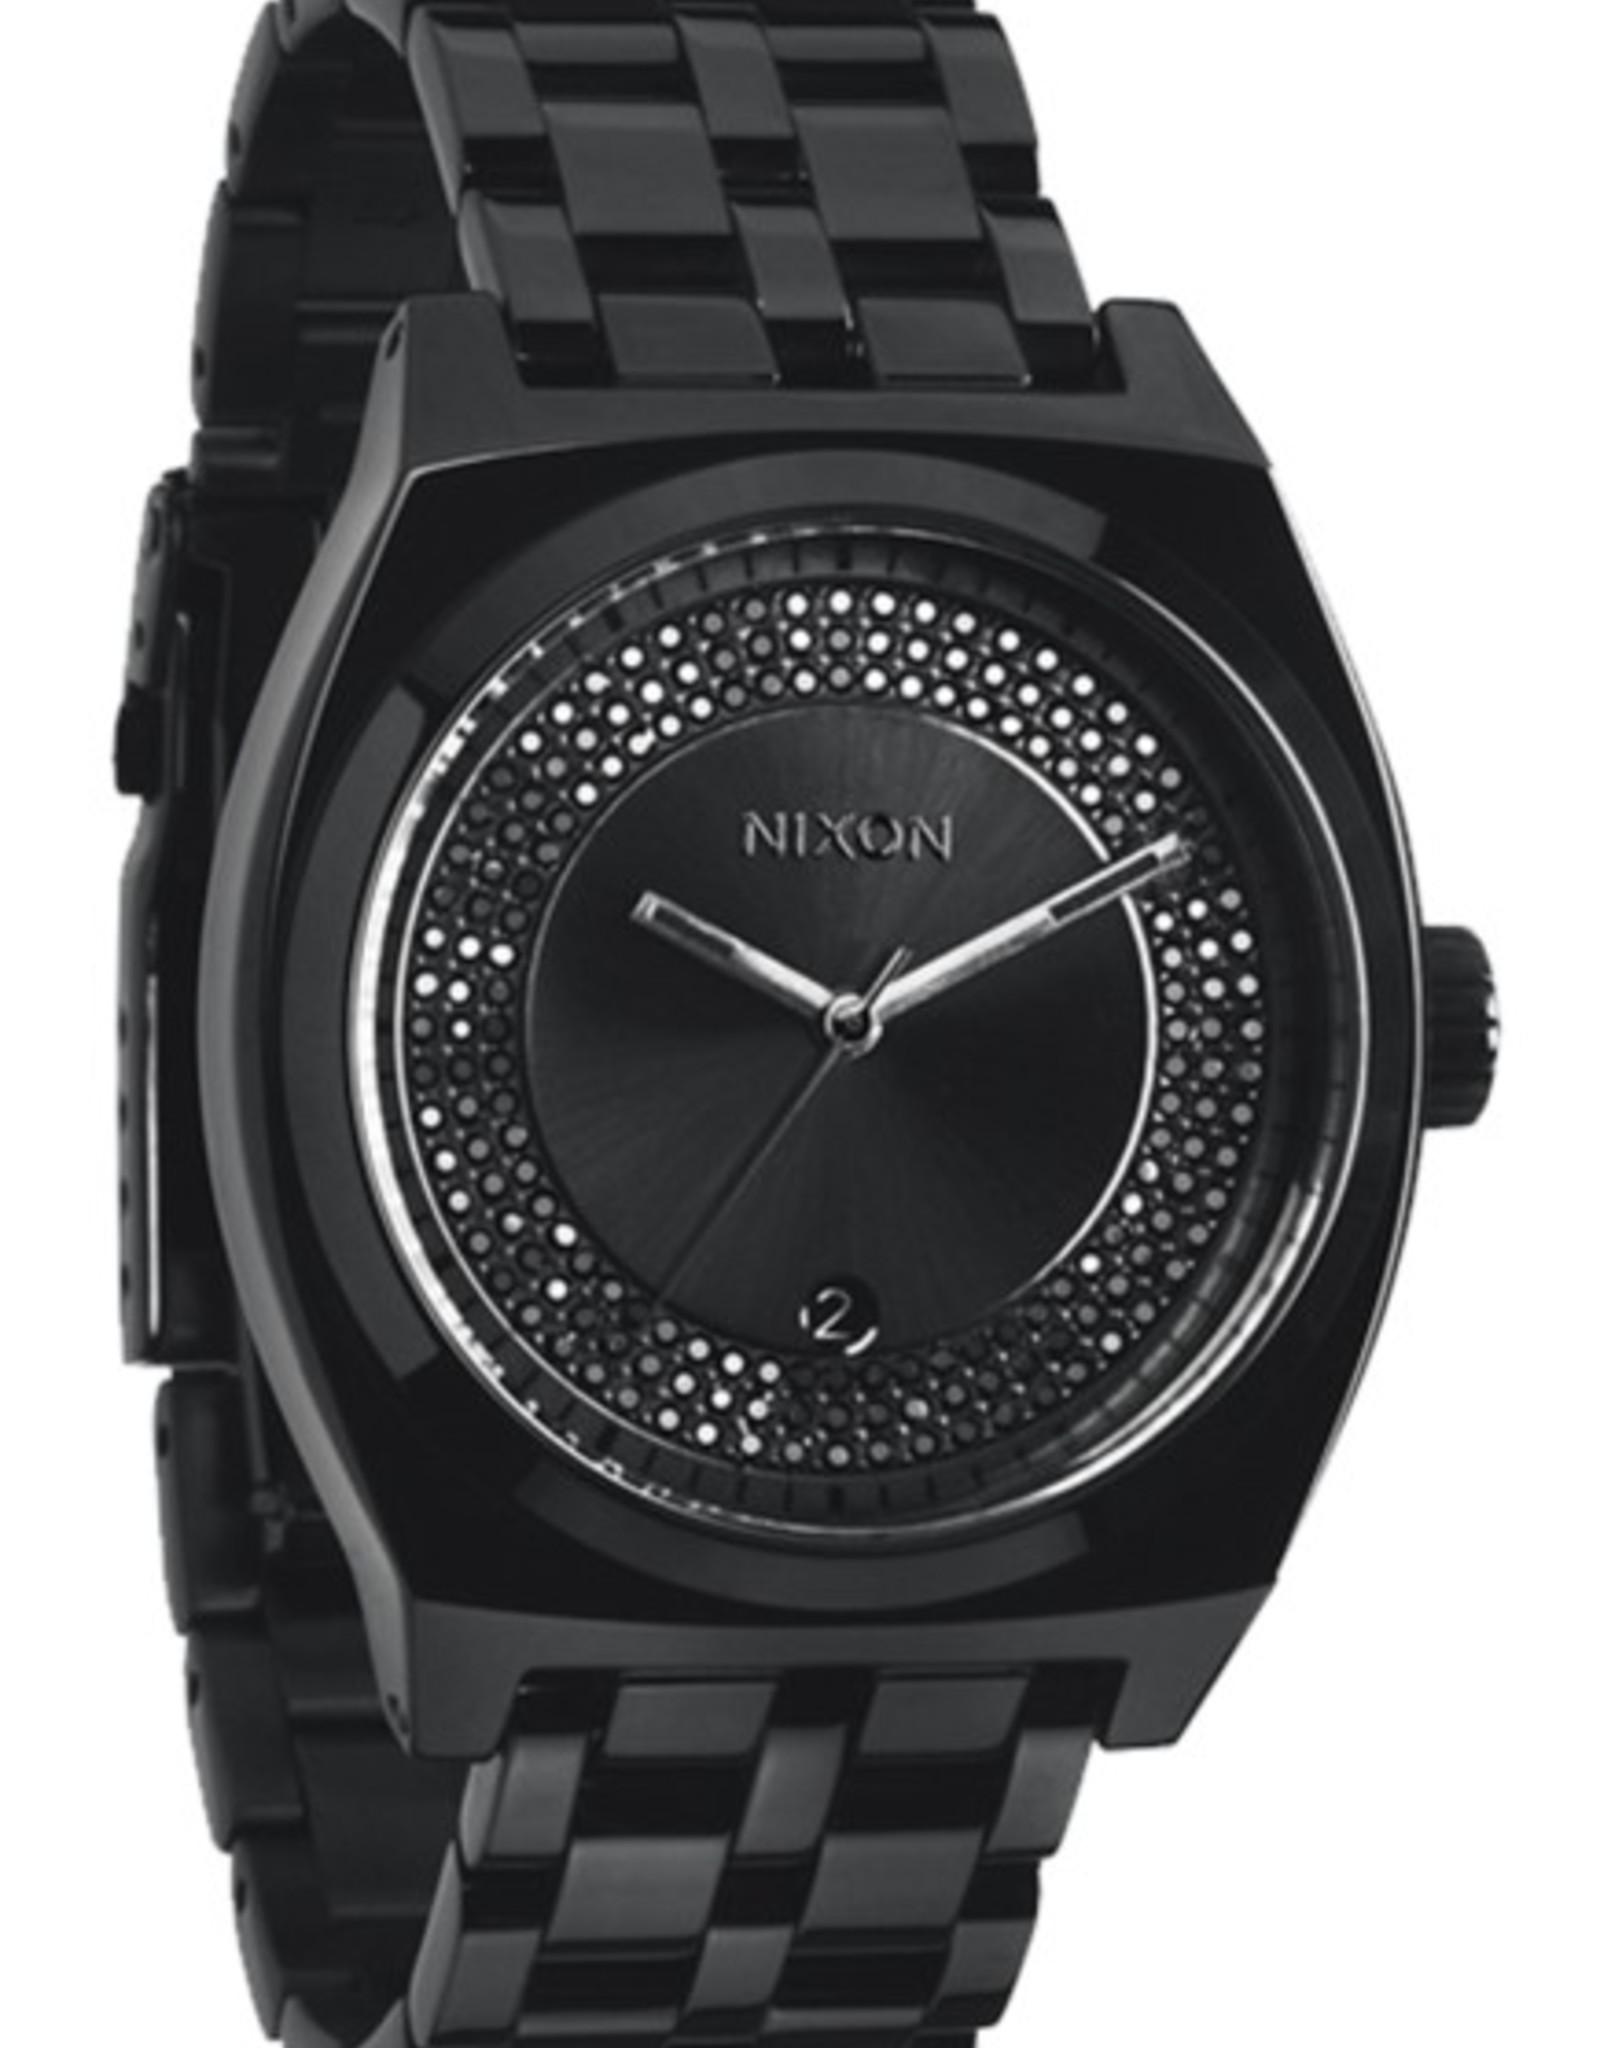 Nixon Nixon - MONOPOLY - All Black / Black Crystal